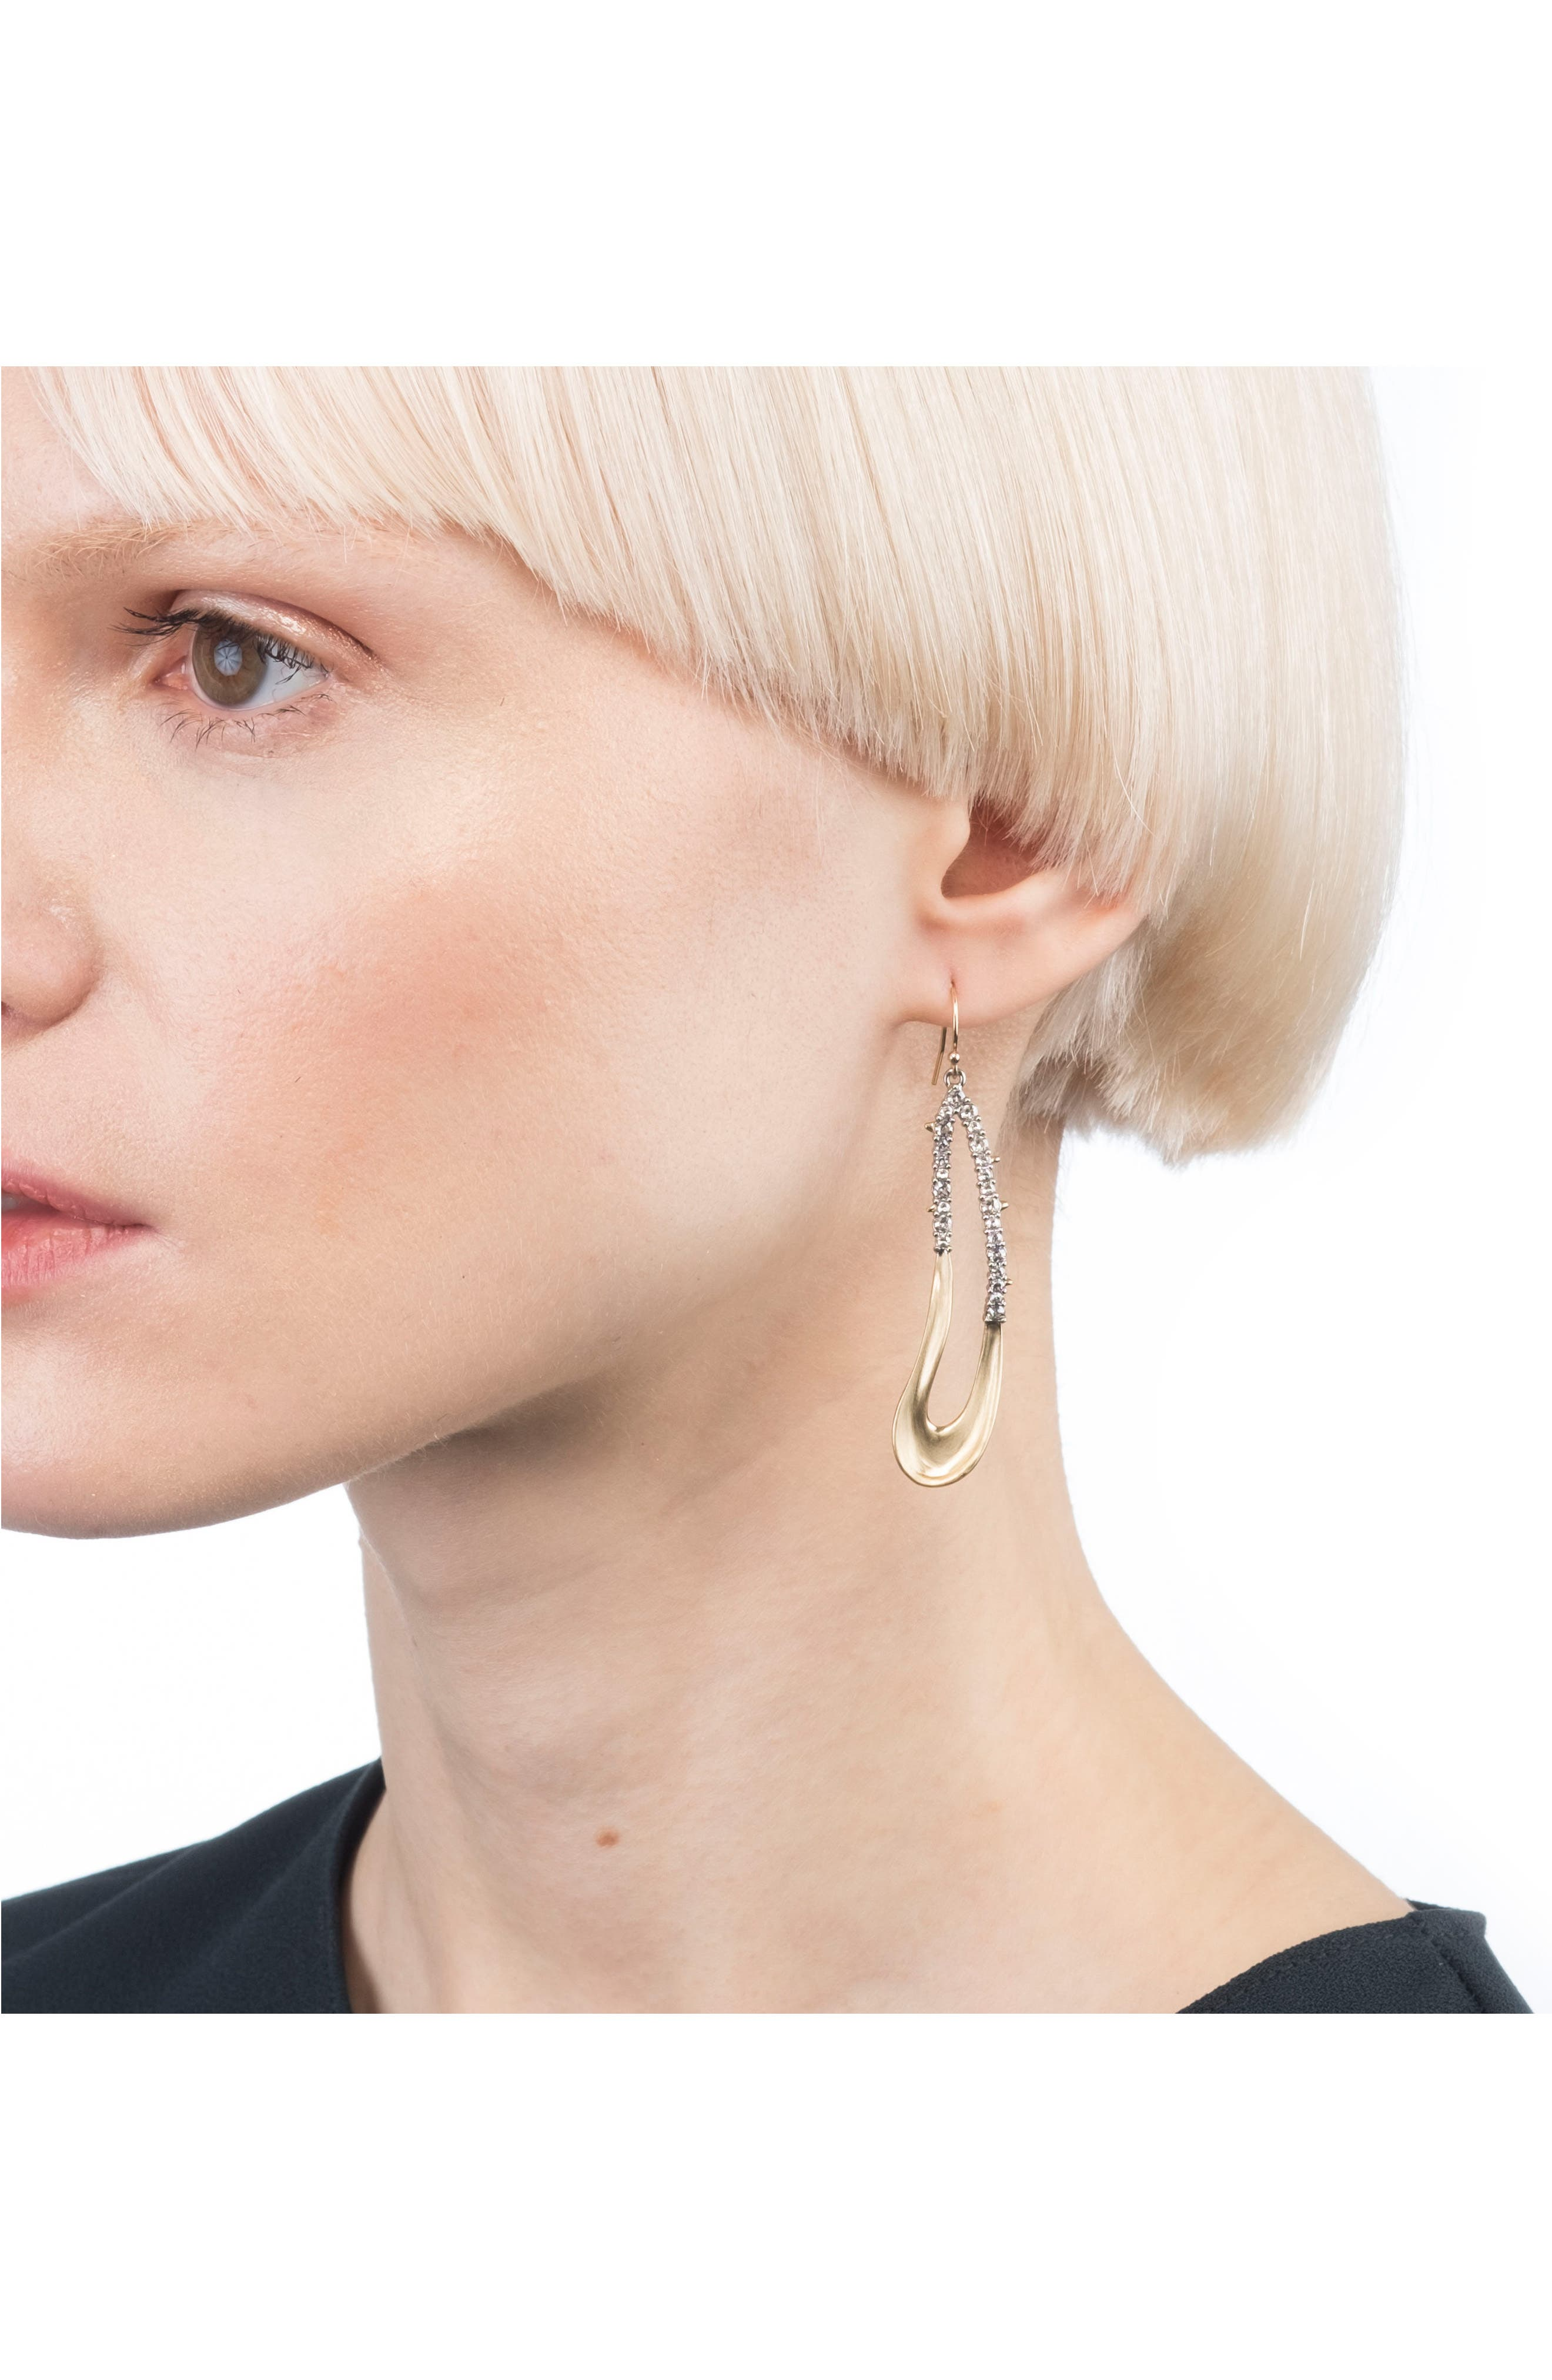 Freeform Crystal Encrusted Drop Earrings,                             Alternate thumbnail 2, color,                             GOLD/ SILVER